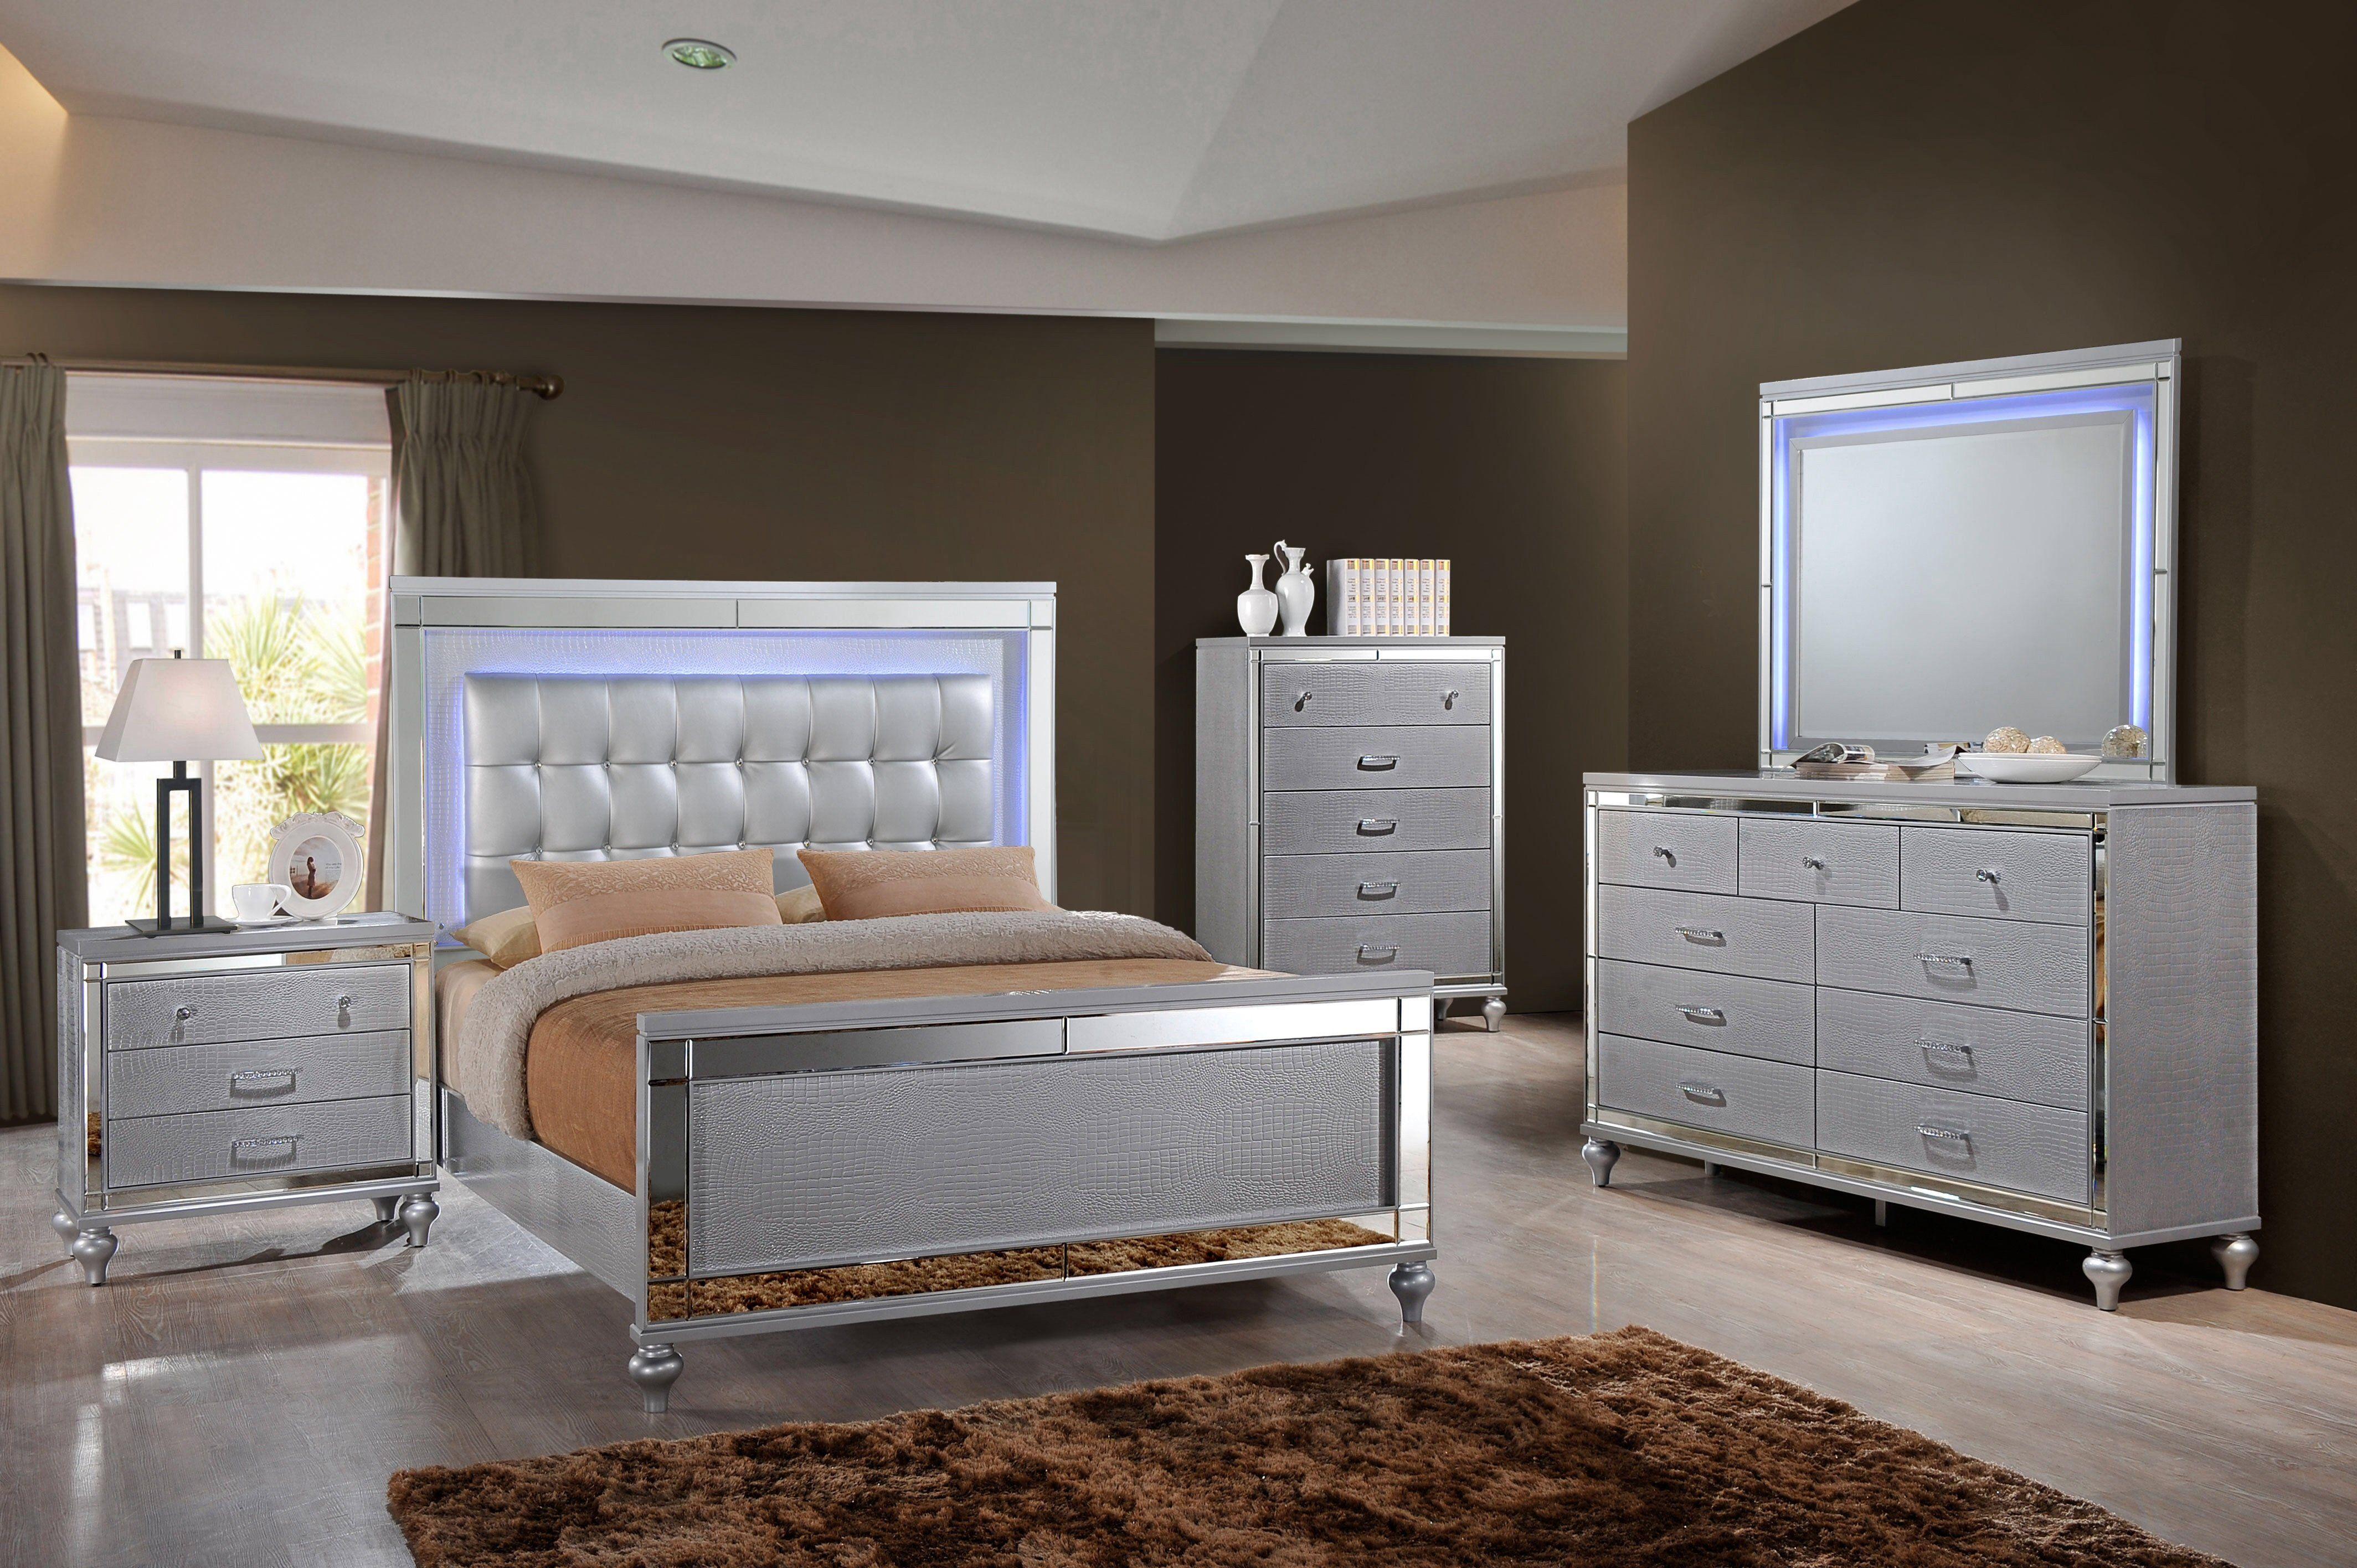 Weekly Or Monthly Led Lit Valentino Silver Aligator Queen Bedroom Group Bedroom Set Bedroom Design Bedroom Sets